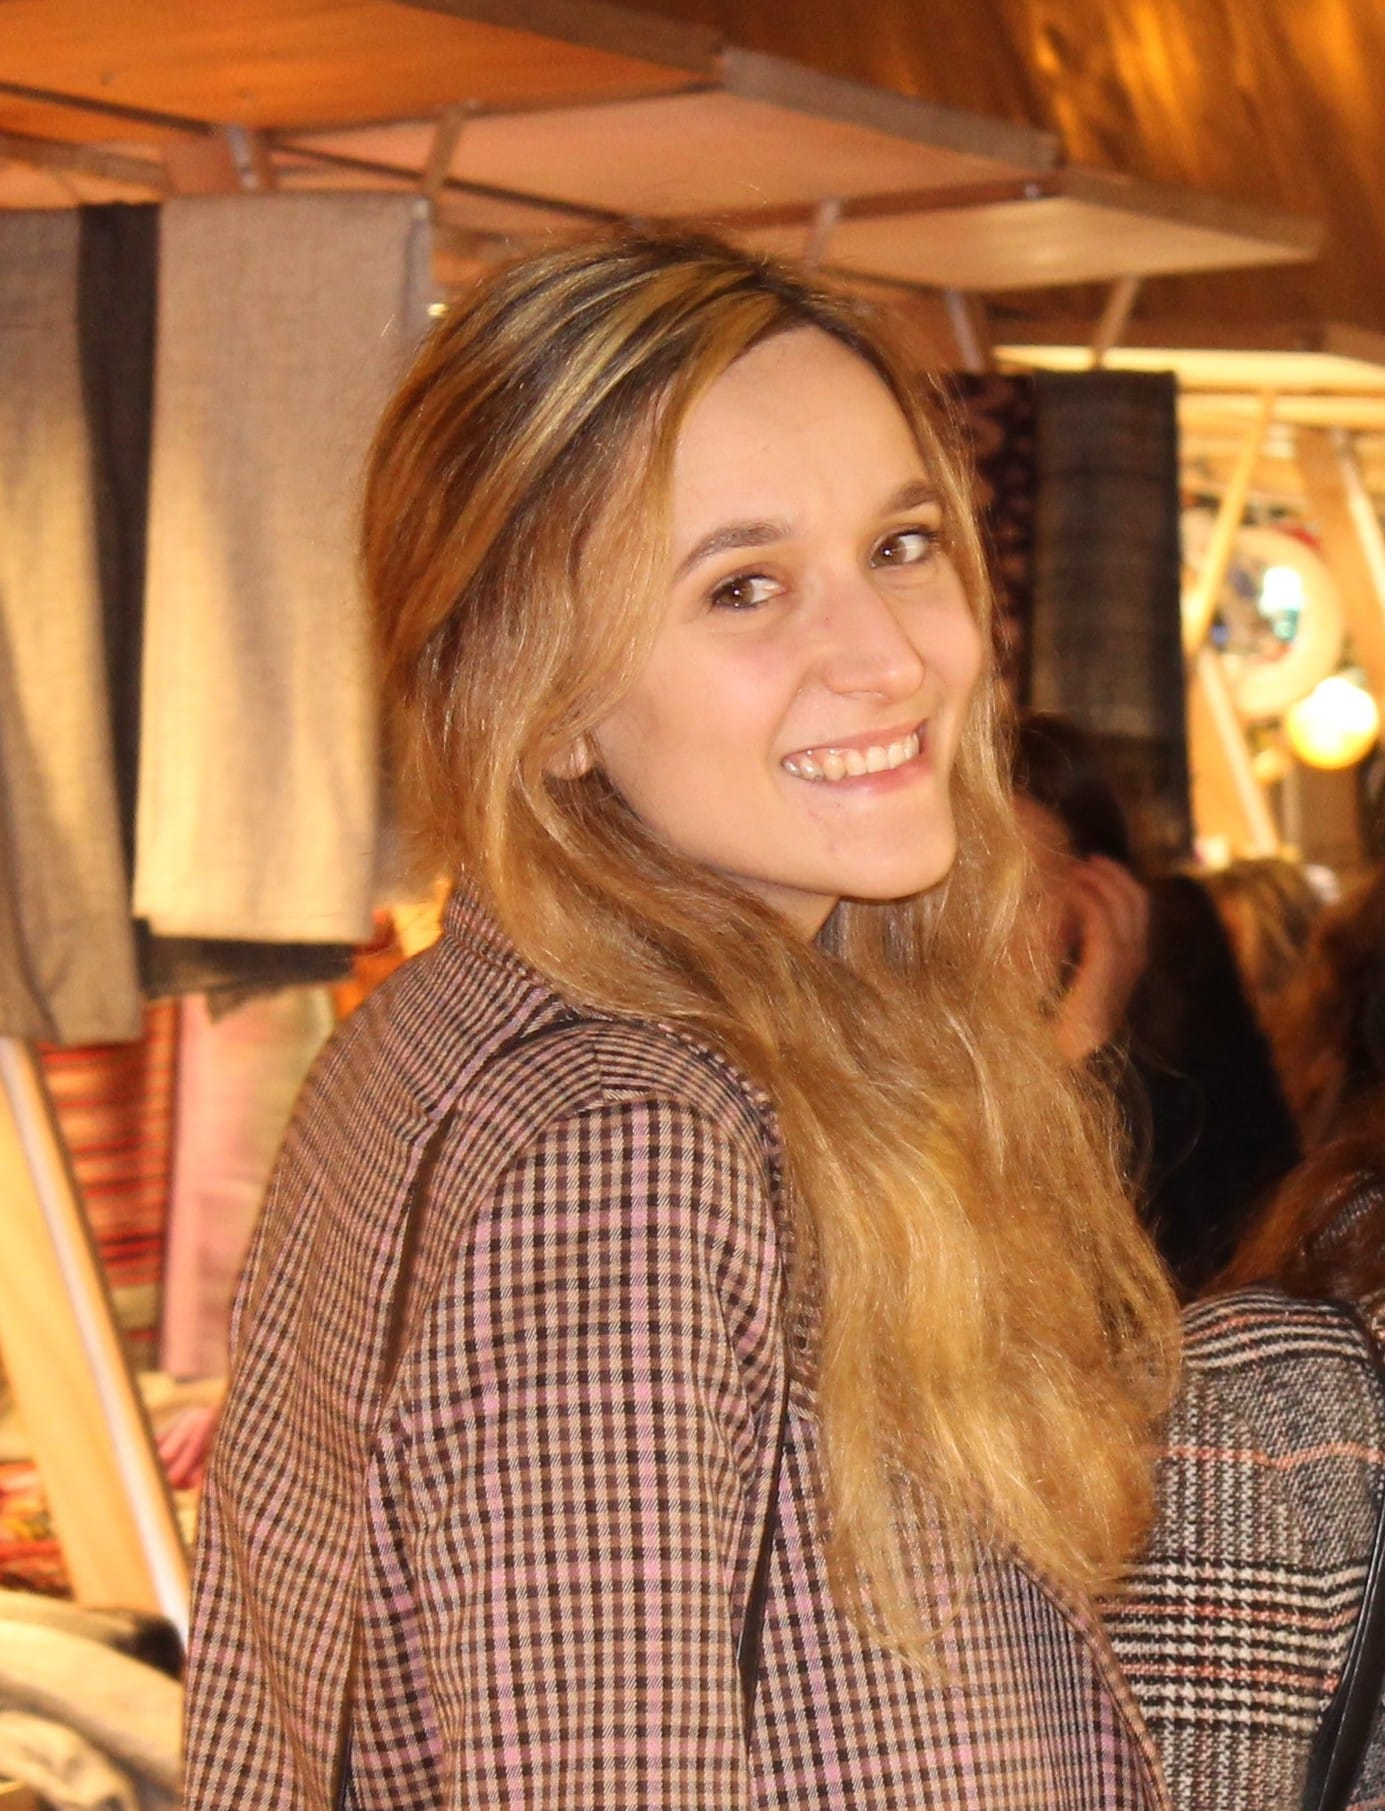 Arianna Vignetti